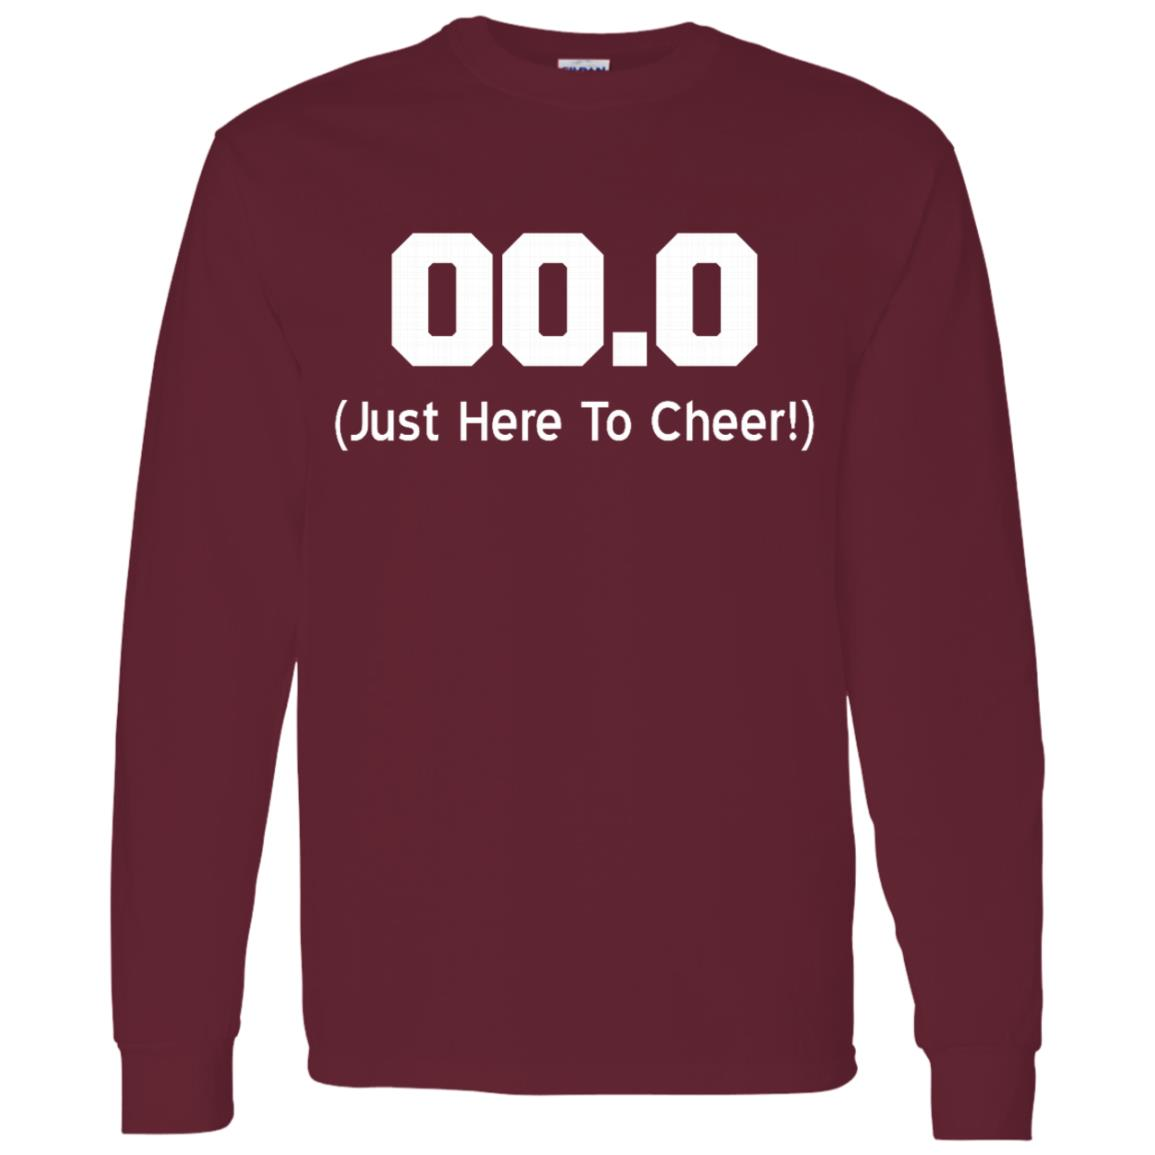 00.0 Just Here To Cheer Running Spectator Men Long Sleeve T-Shirt